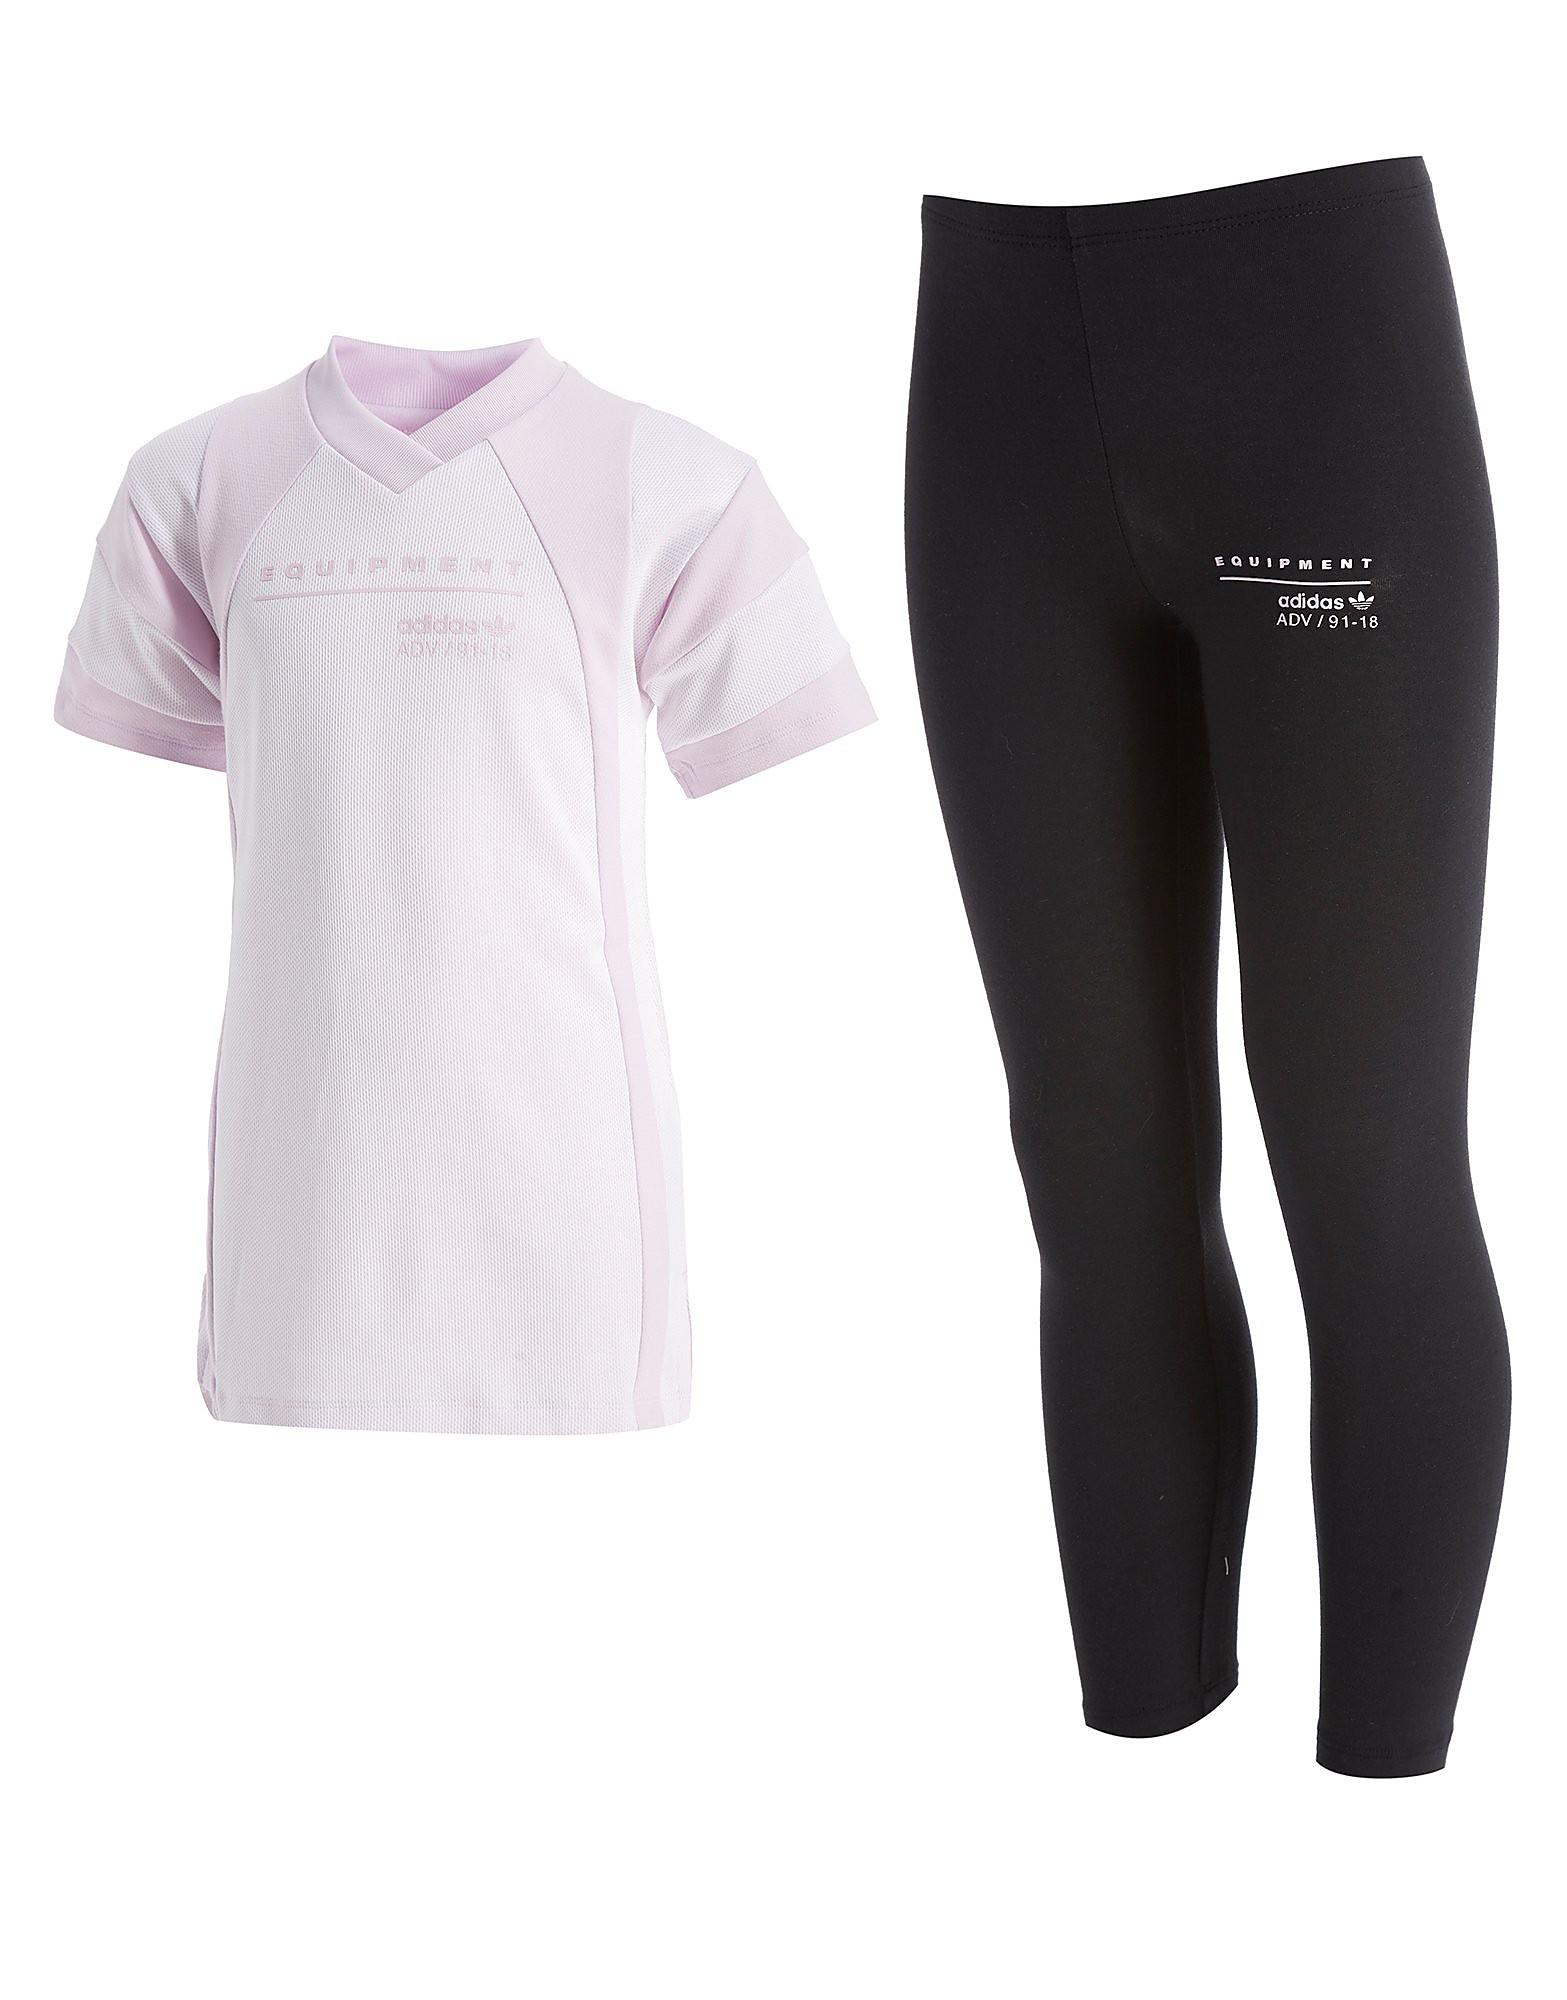 adidas Originals Girls' EQT T-Shirt & Legging Set Children